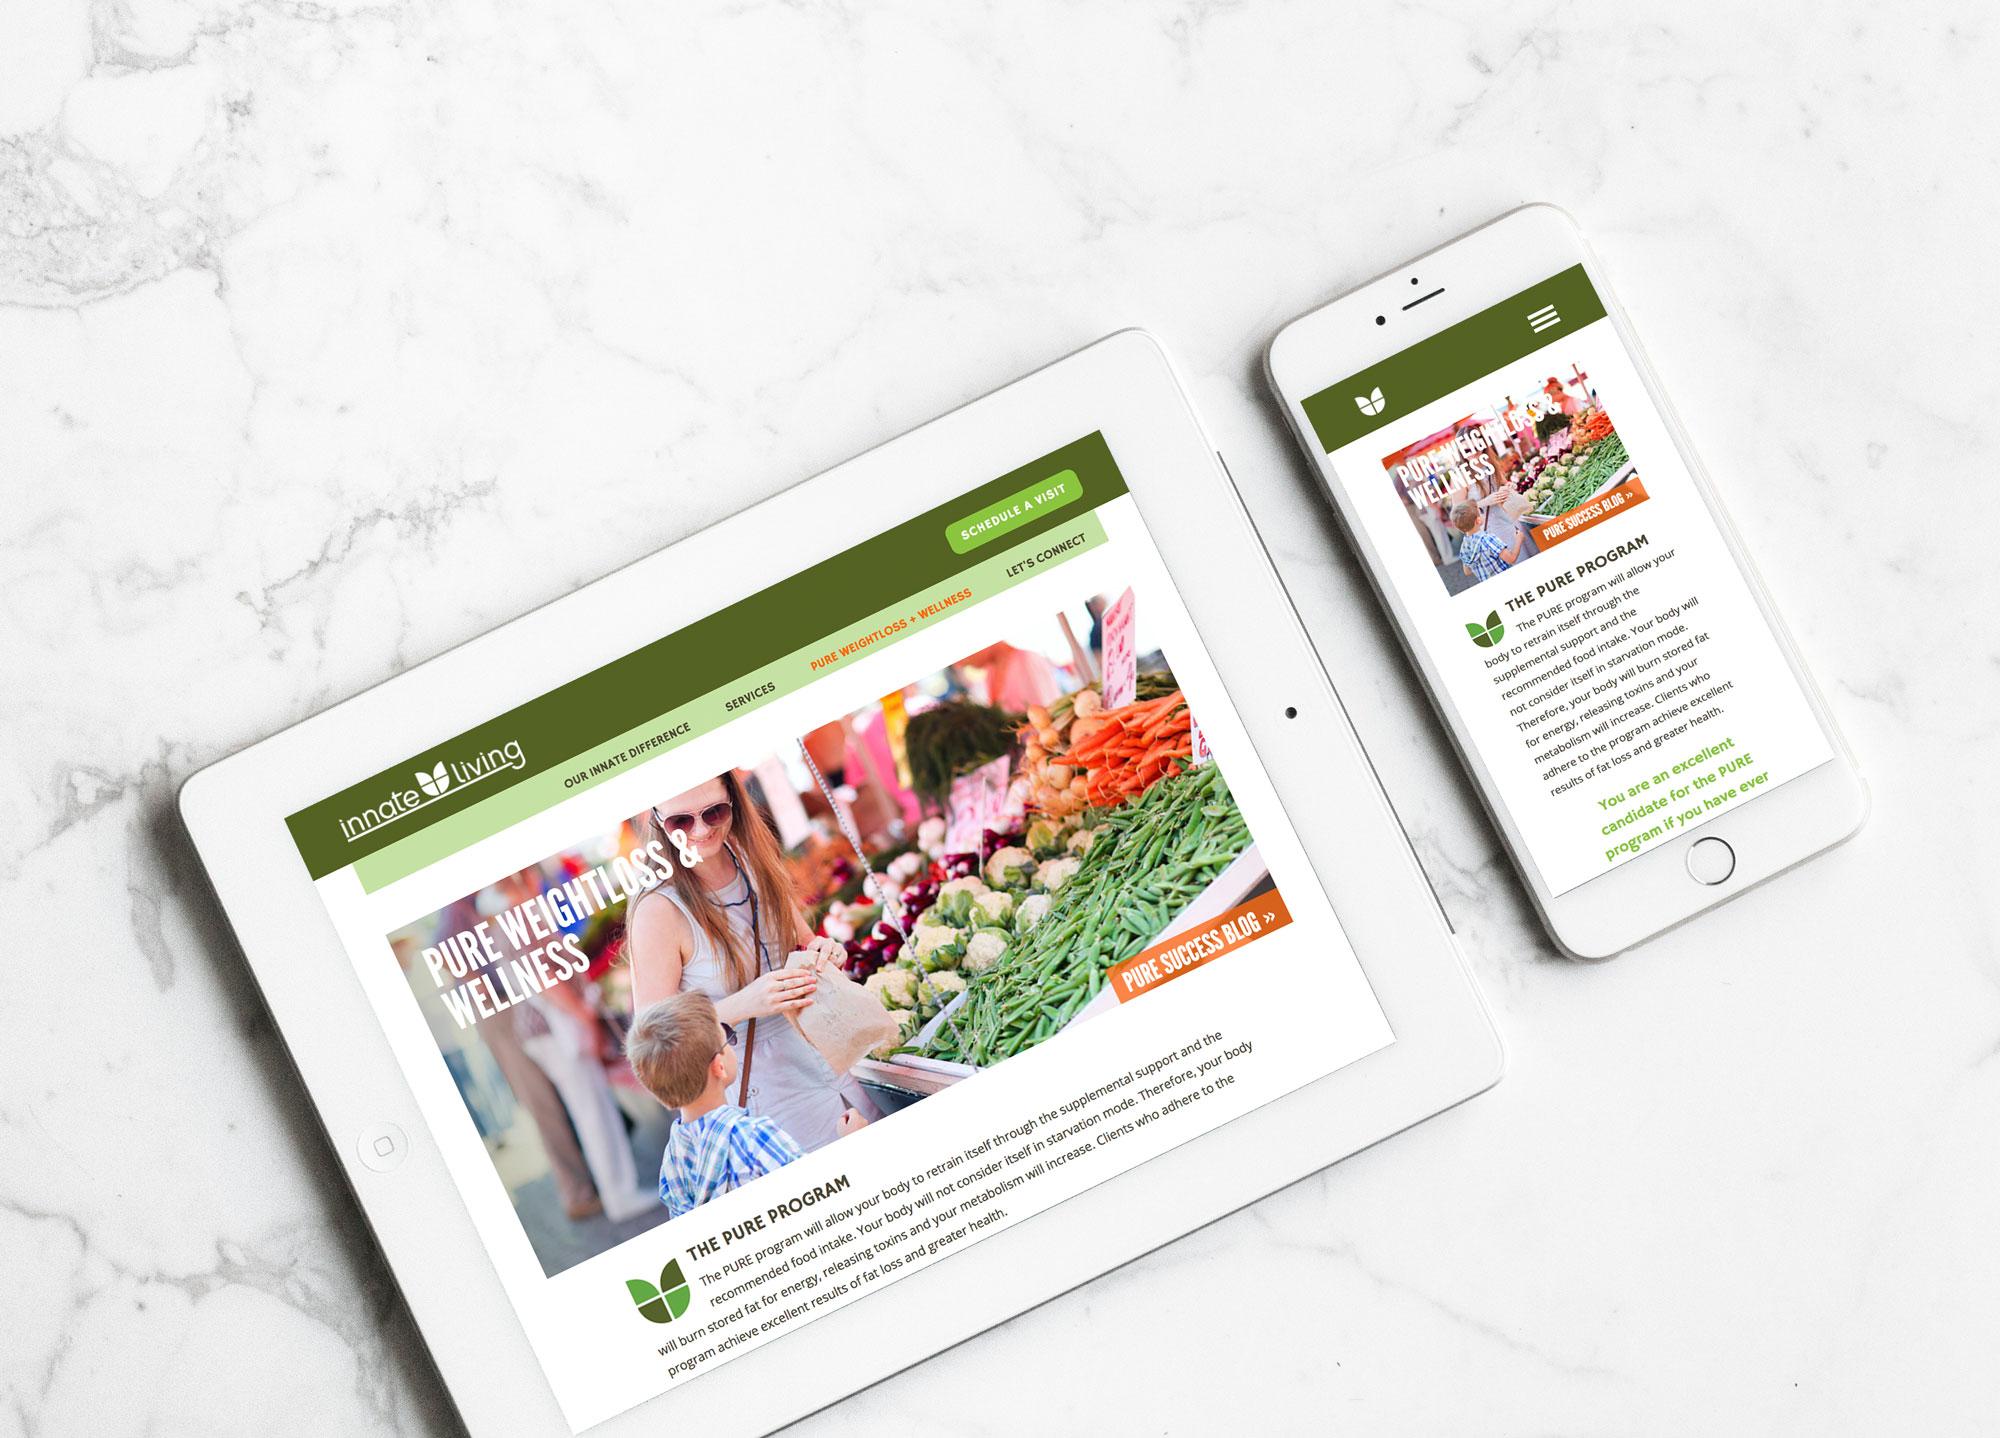 grass-creative-branding-identity-nutrition-NYC-NJ-pure-wellness-website-mobile.jpg